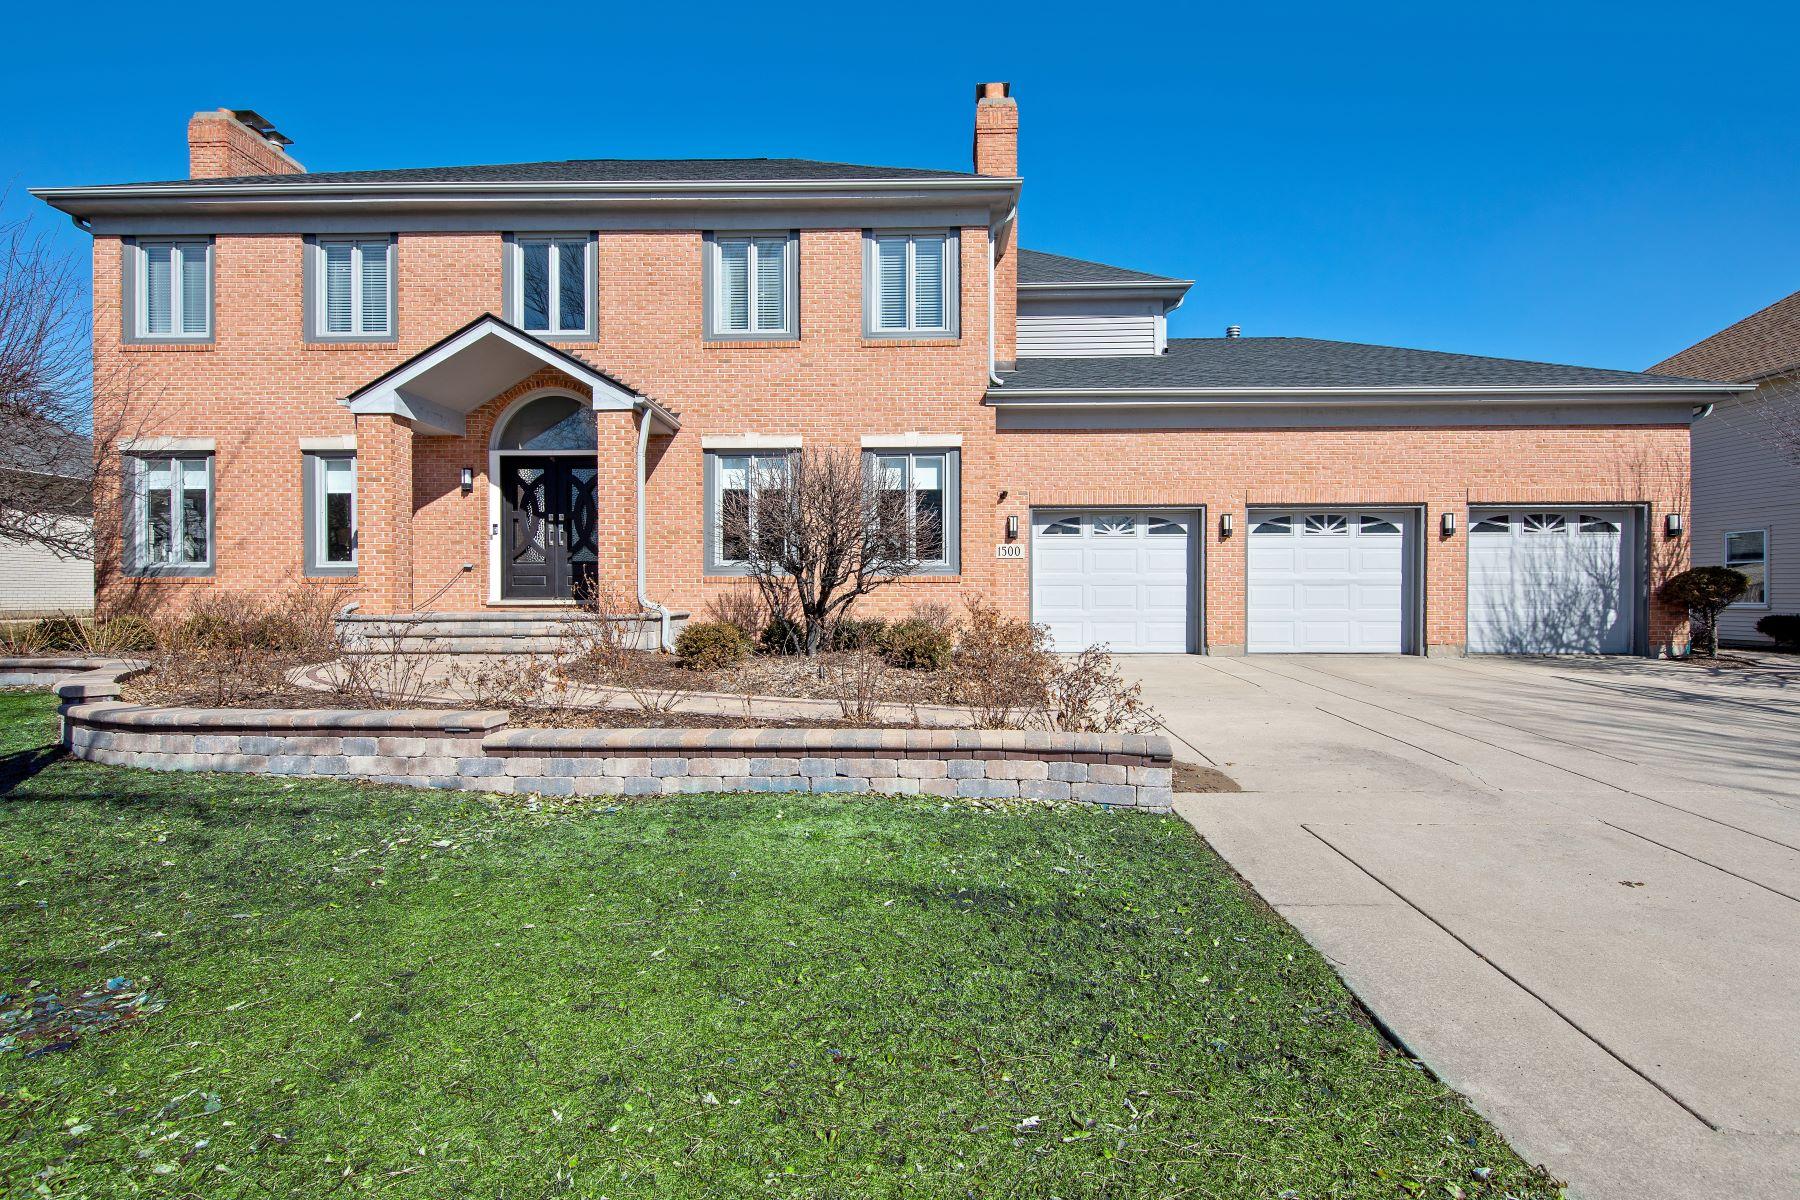 Single Family Homes για την Πώληση στο 1500 Burberry Lane, Schaumburg, IL 60173 Schaumburg, Ιλινοϊσ 60173 Ηνωμένες Πολιτείες